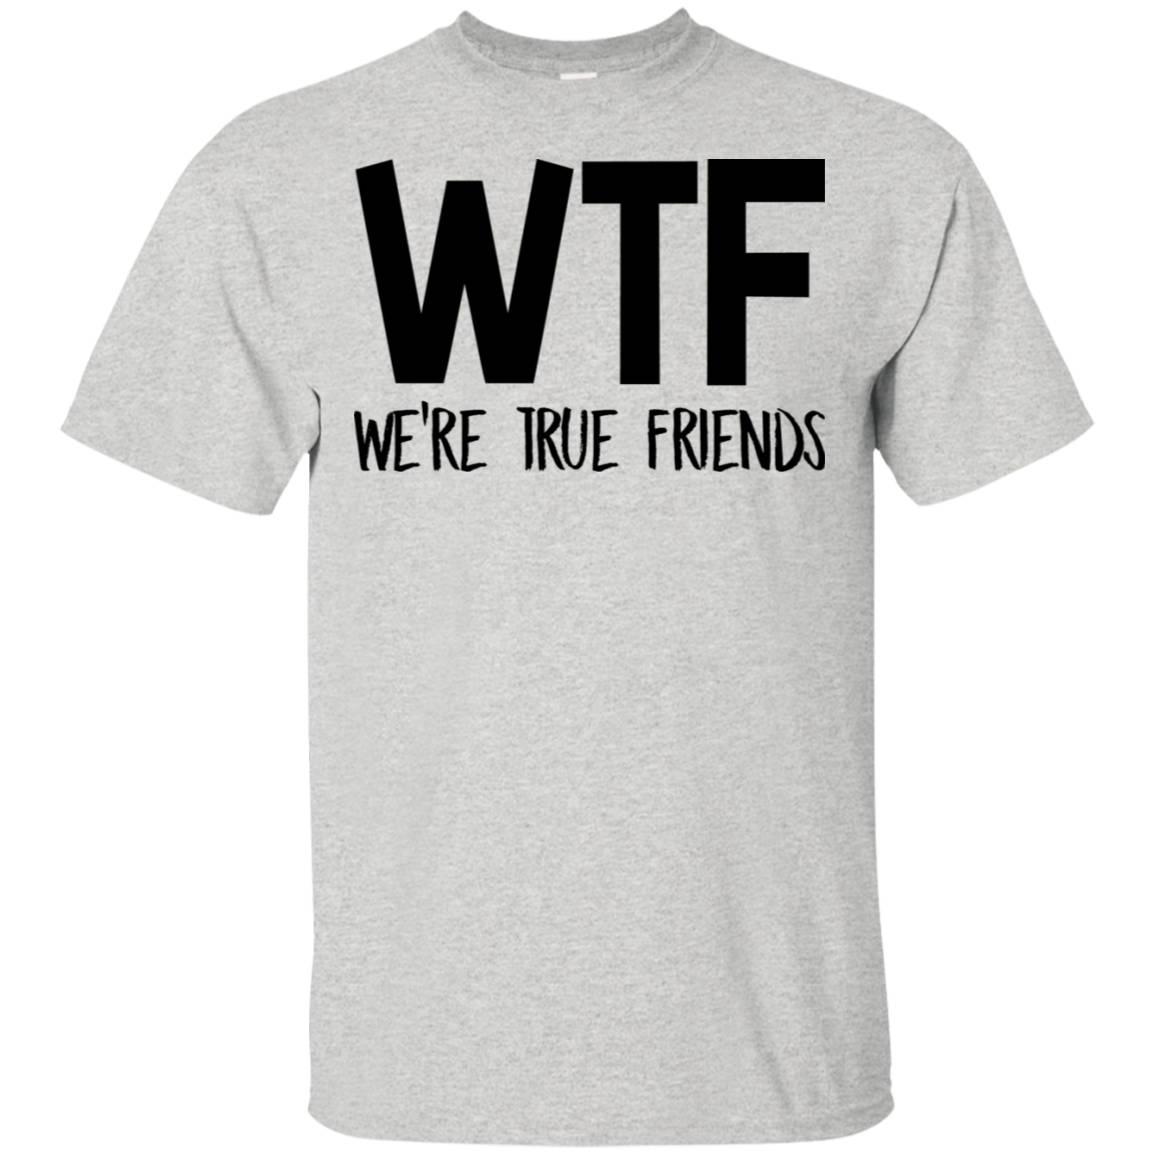 the nice shirts